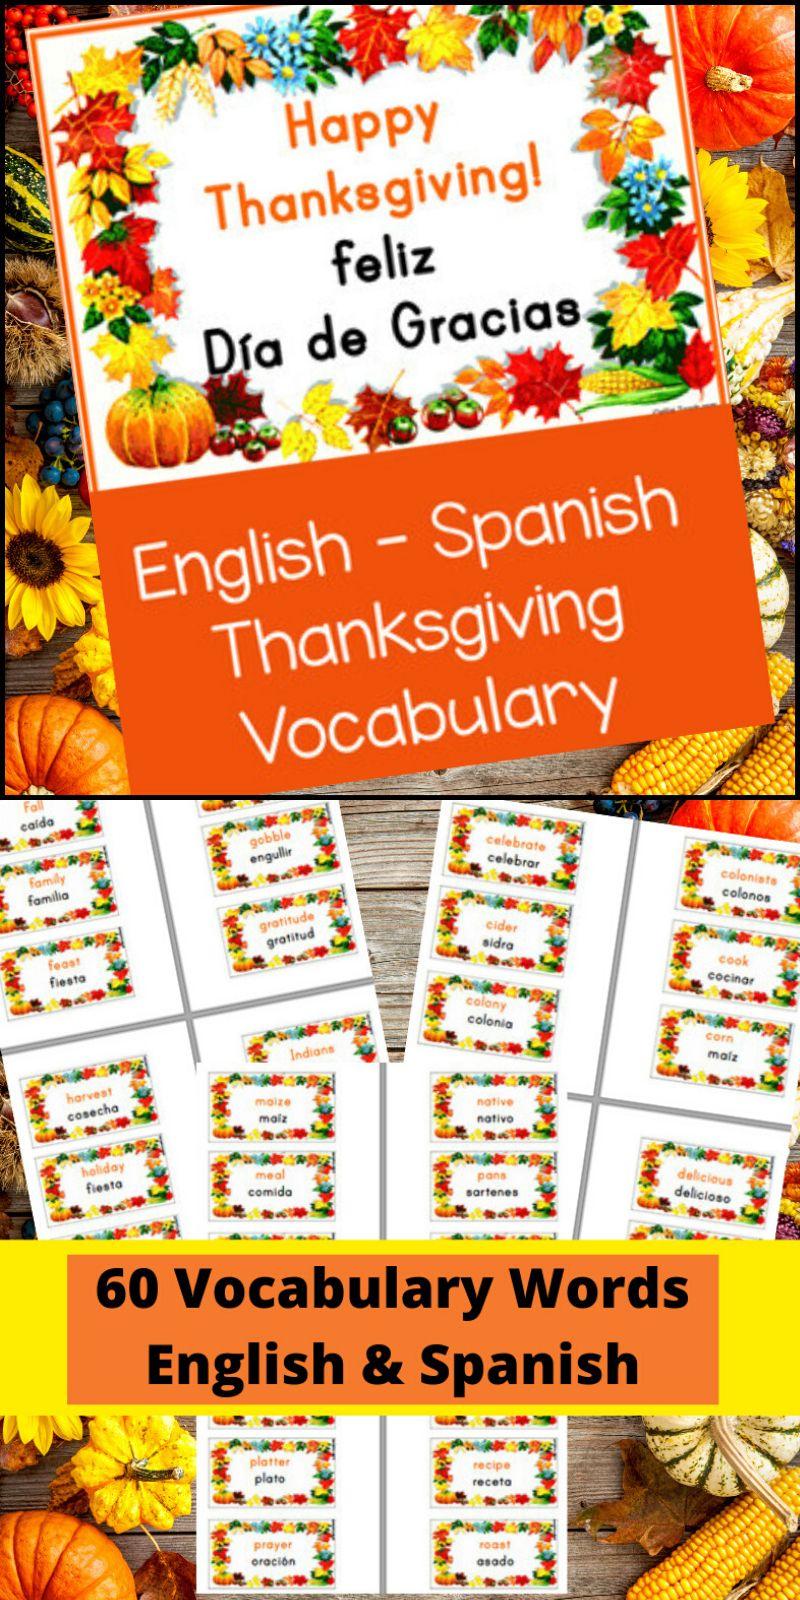 This EnglishSpanish Thanksgiving Vocabulary resource